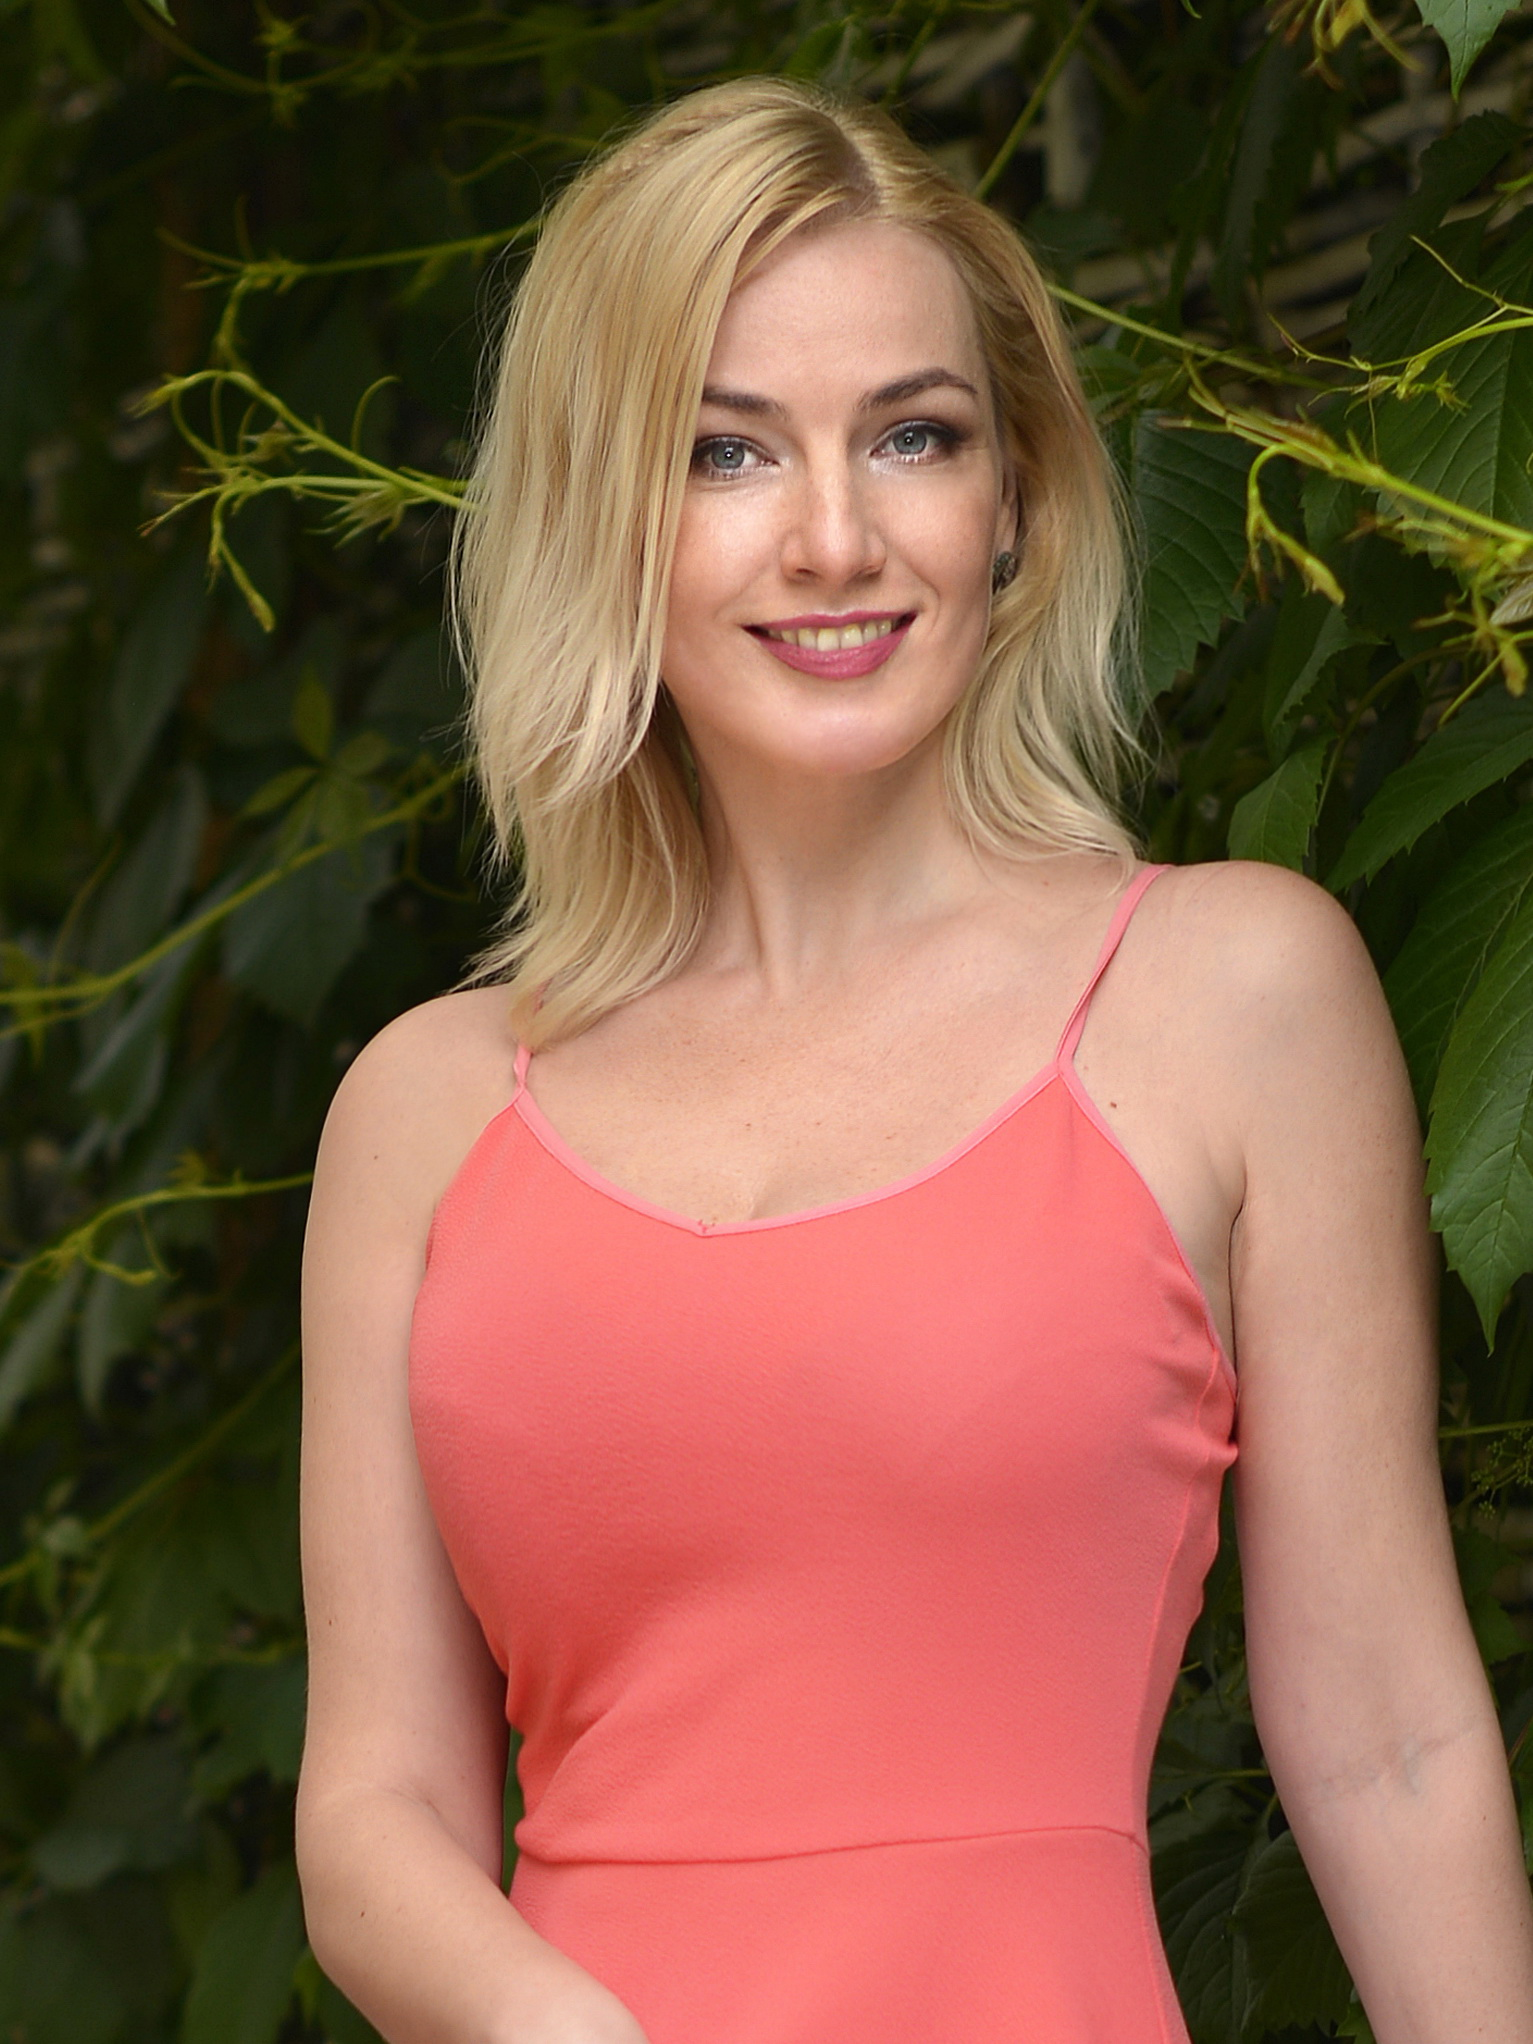 Eugenia   Femme ukrainienne   agence matrimoniale   Au